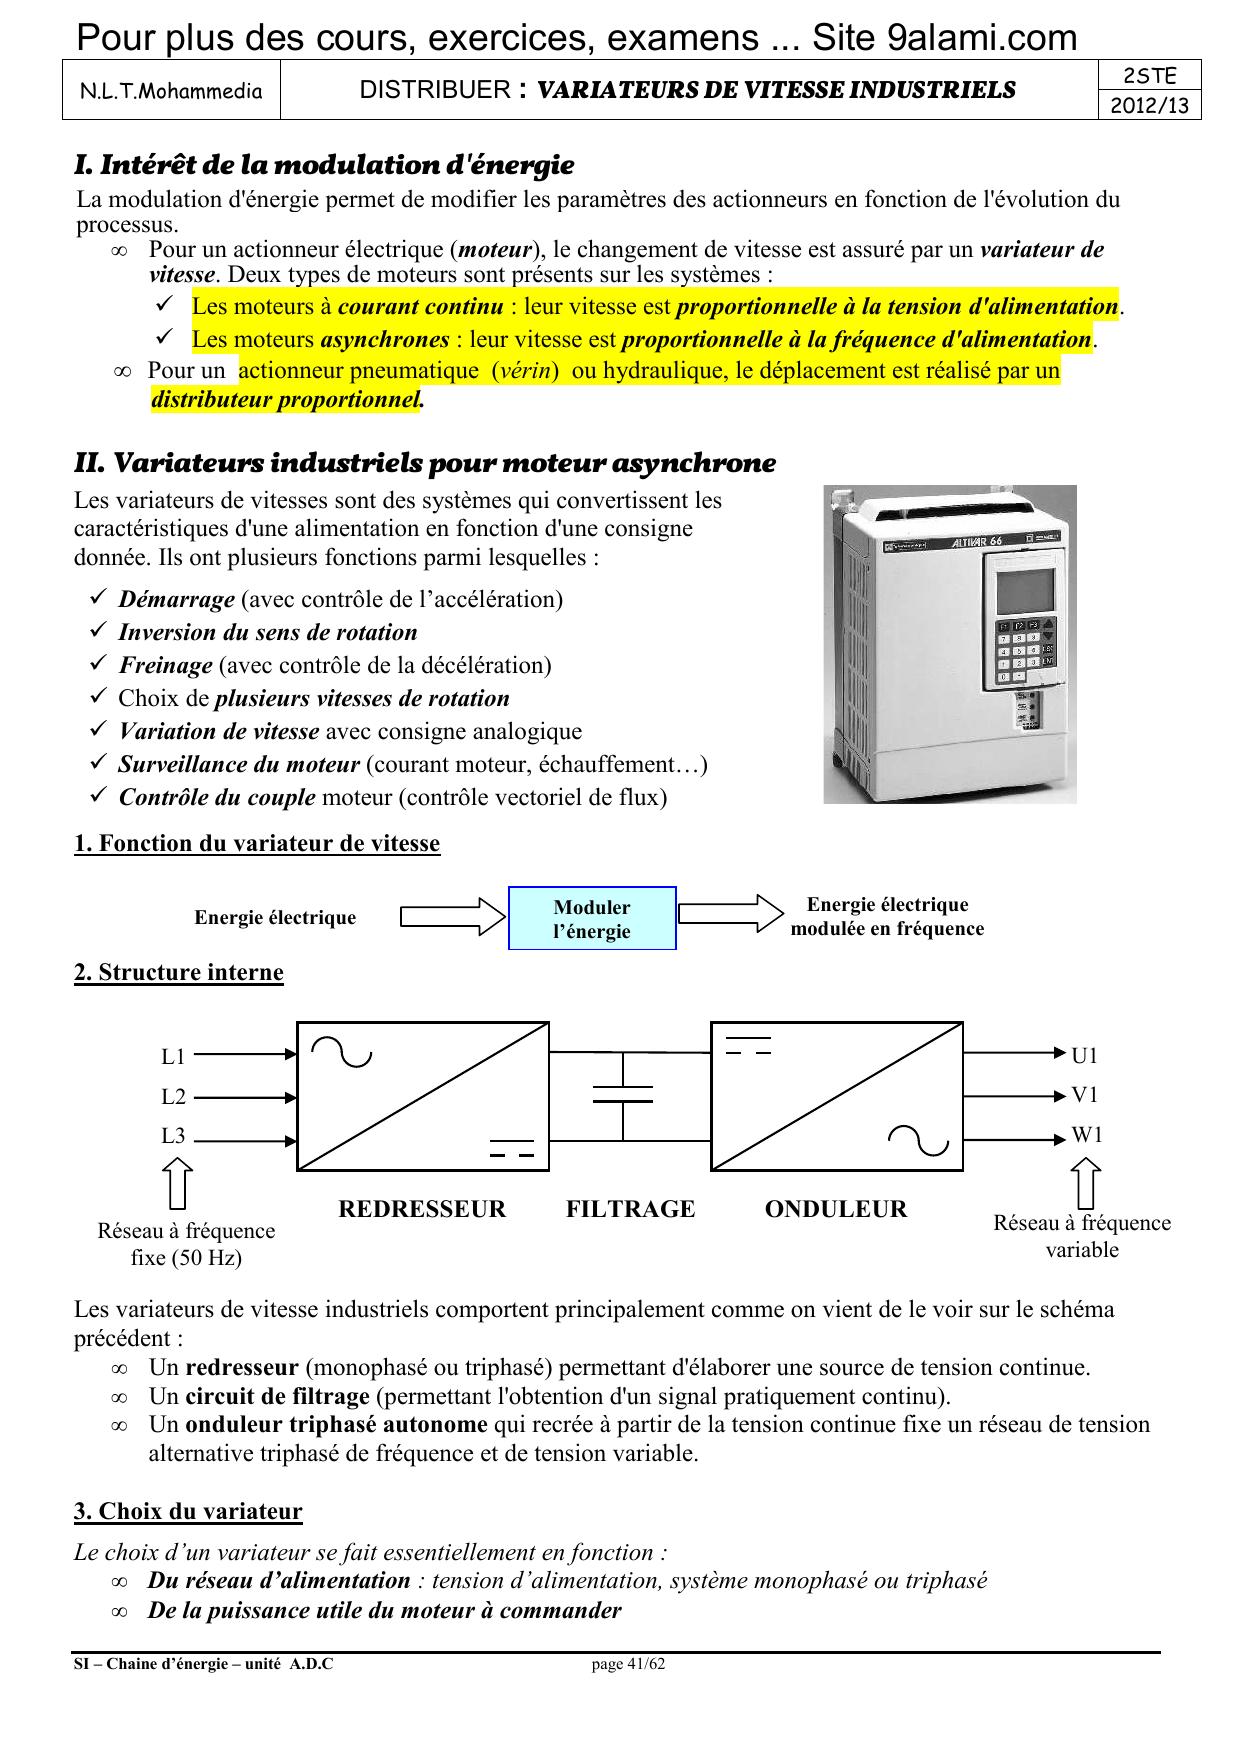 I Interet De La Modulation D Energie